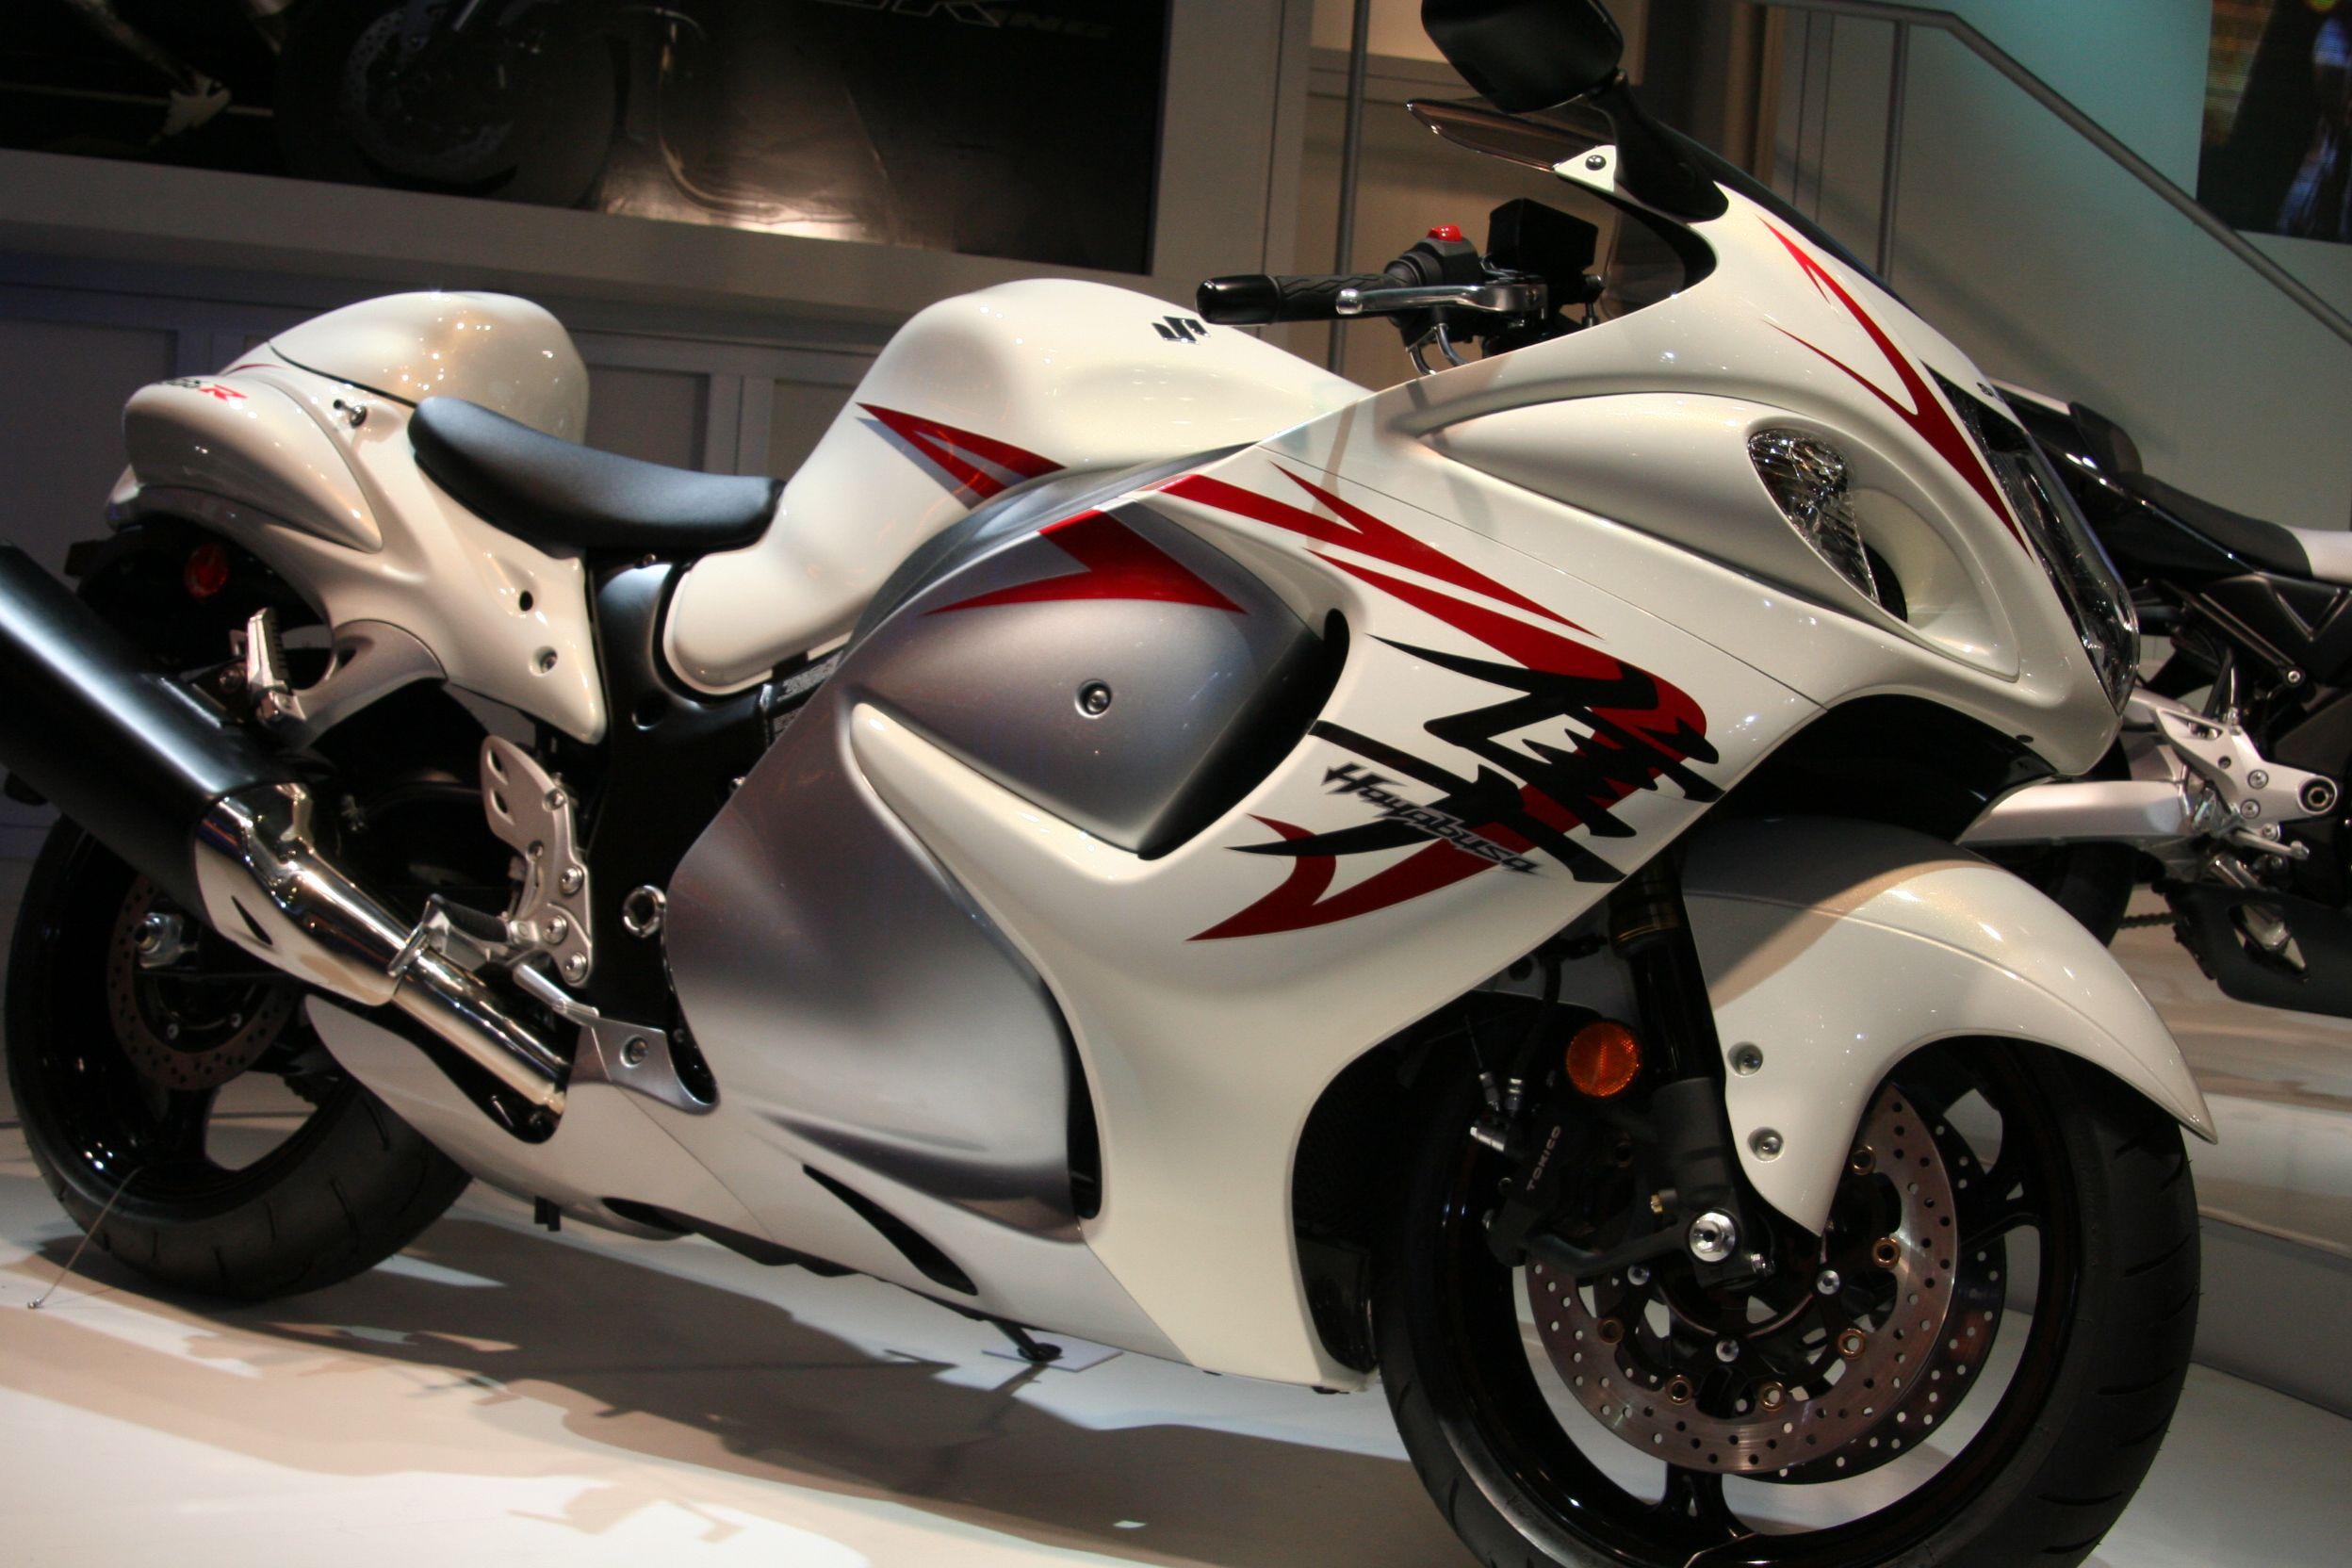 Ordinaire Suzuki Hayabusa Motorcycle In White And Red Wallpaper